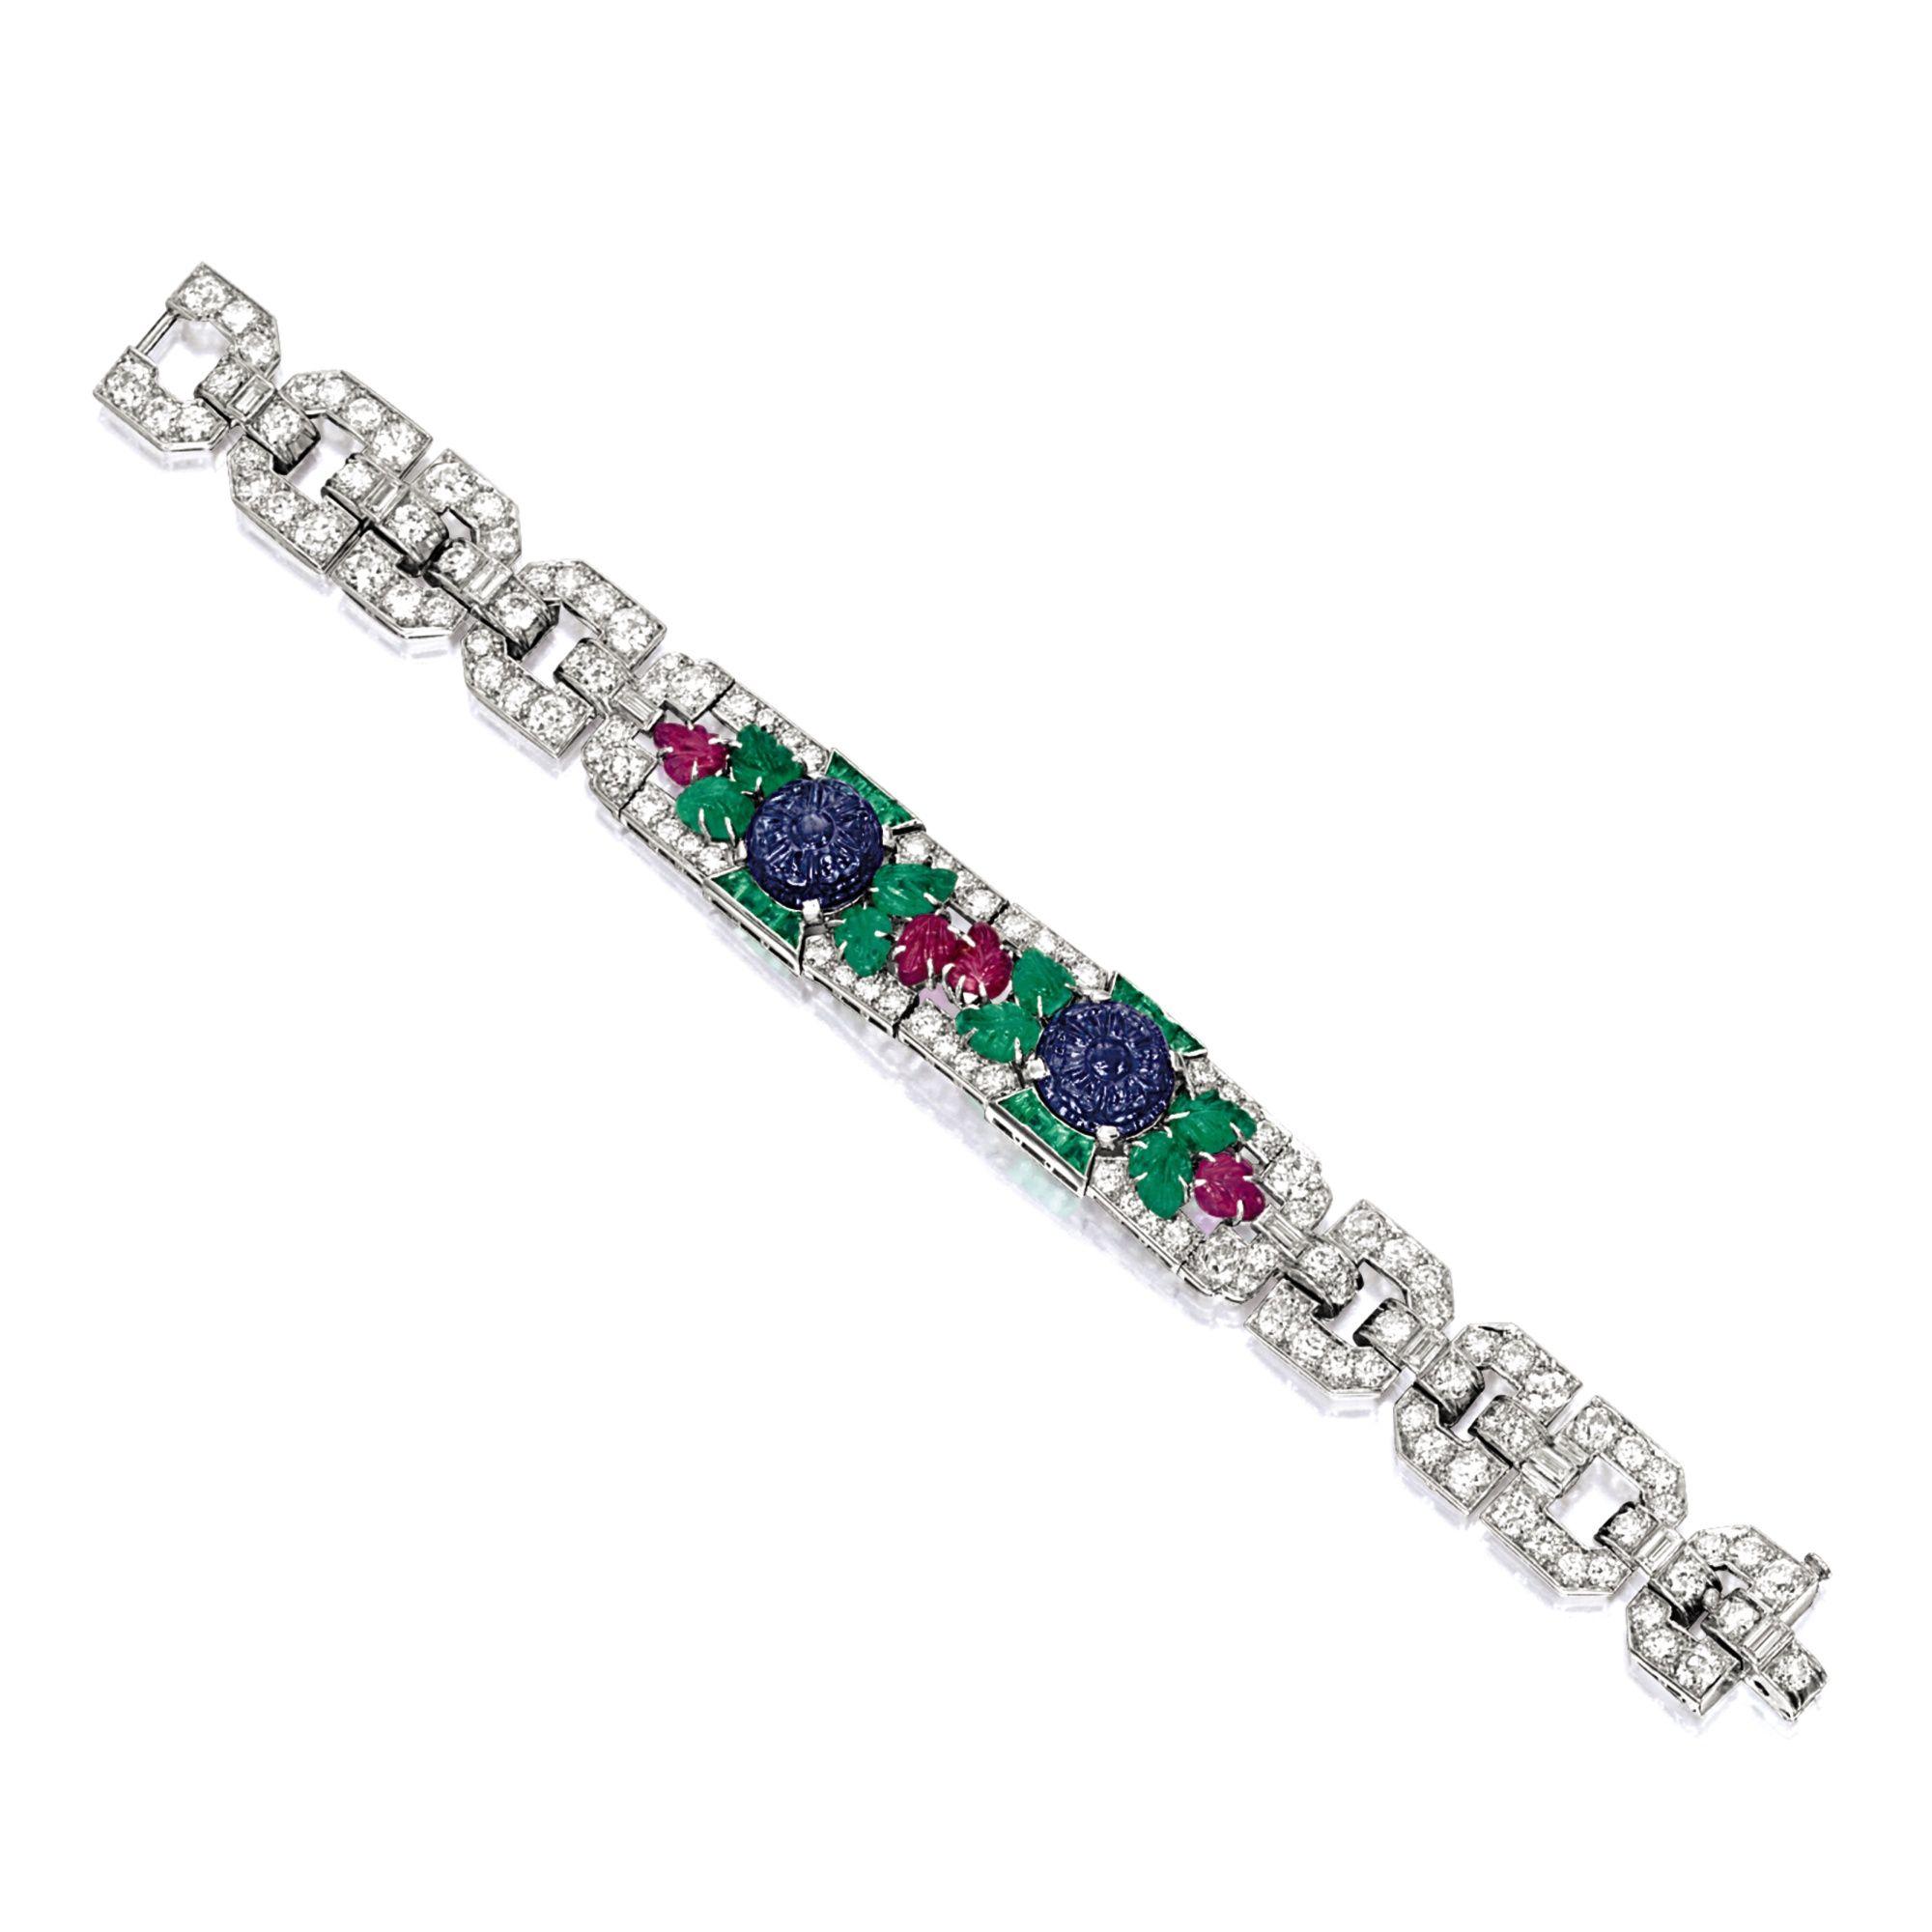 Gemset and diamond bracelet circa of tutti frutti design the